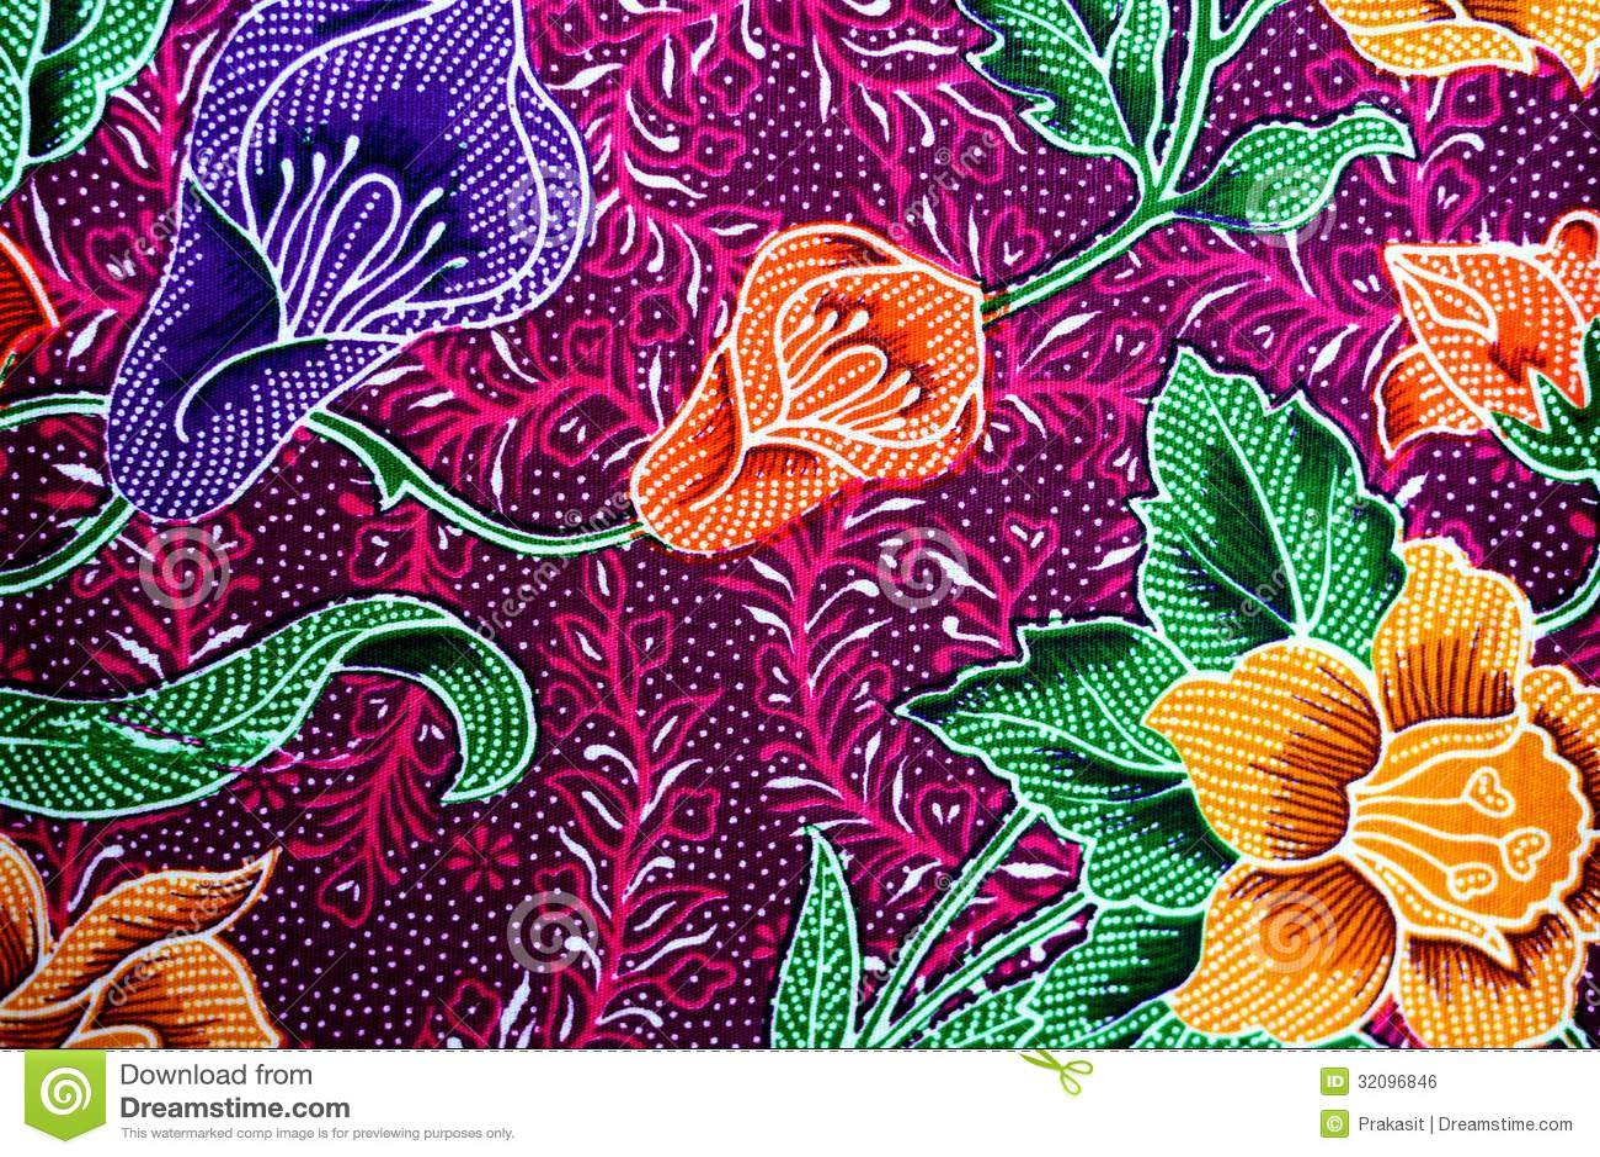 Colorful Batik Cloth Fabric Background Royalty Free Stock Image ...